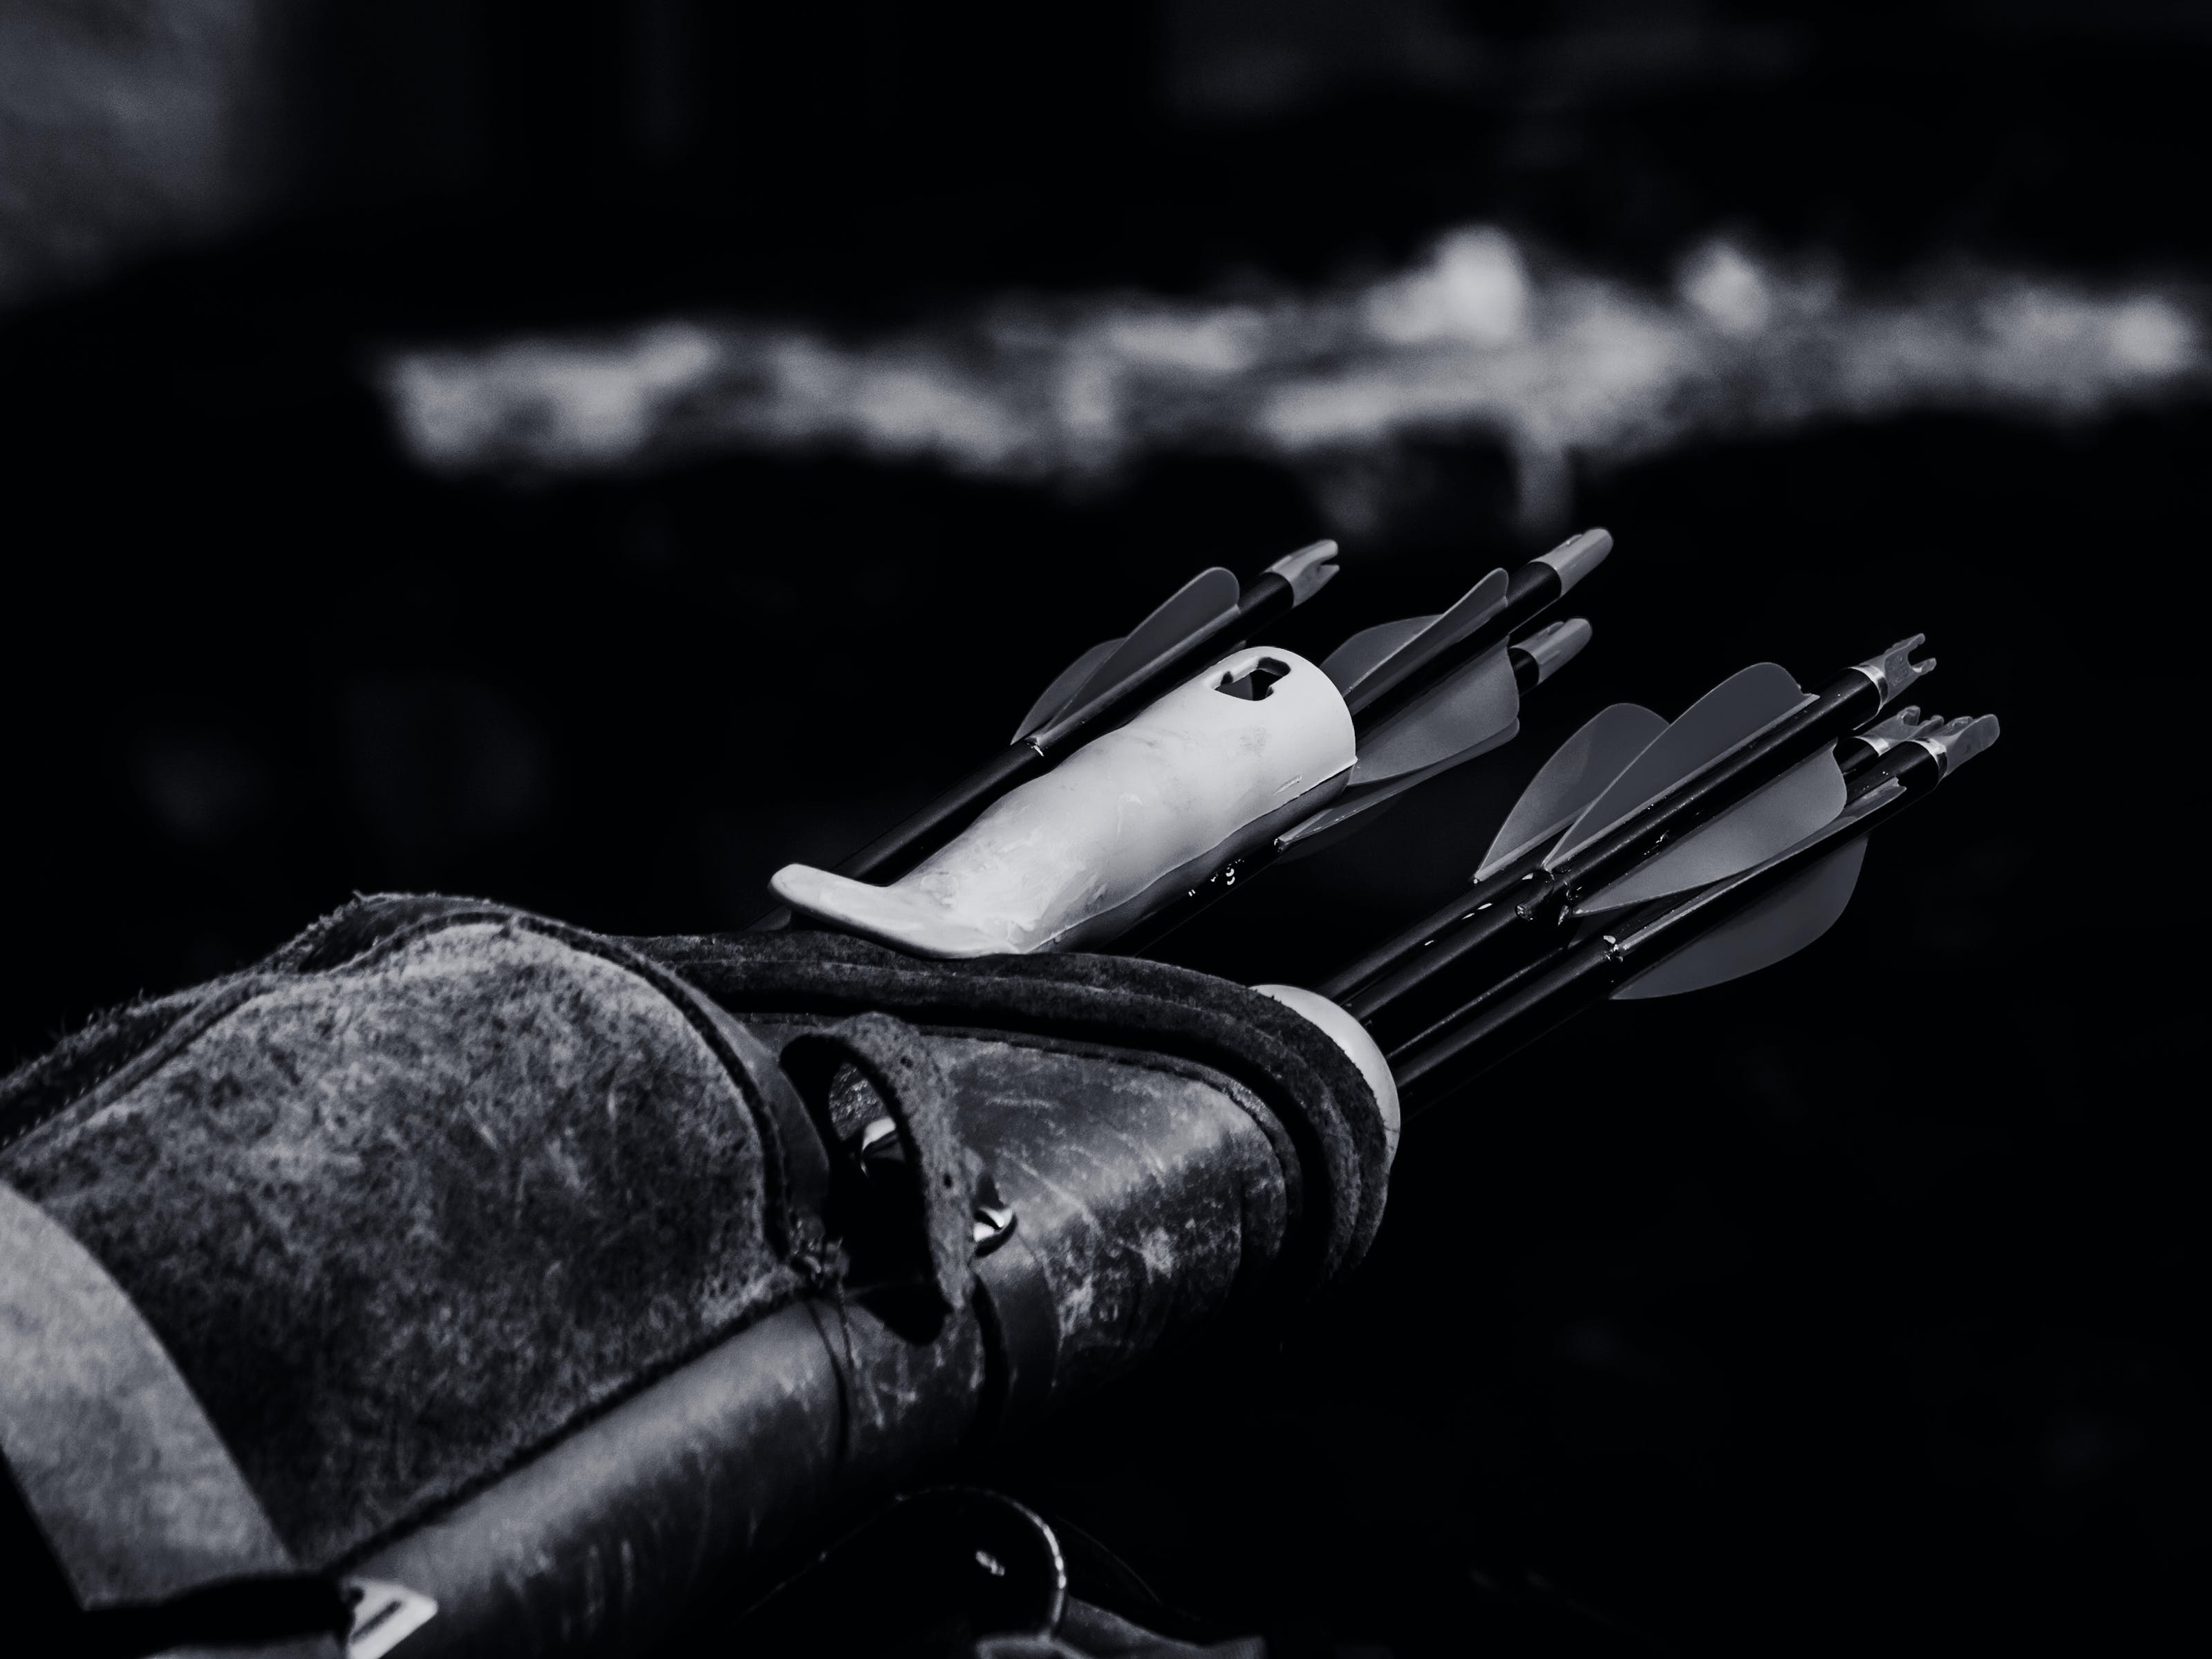 Grayscale Photo of Arrow Inside Black Case